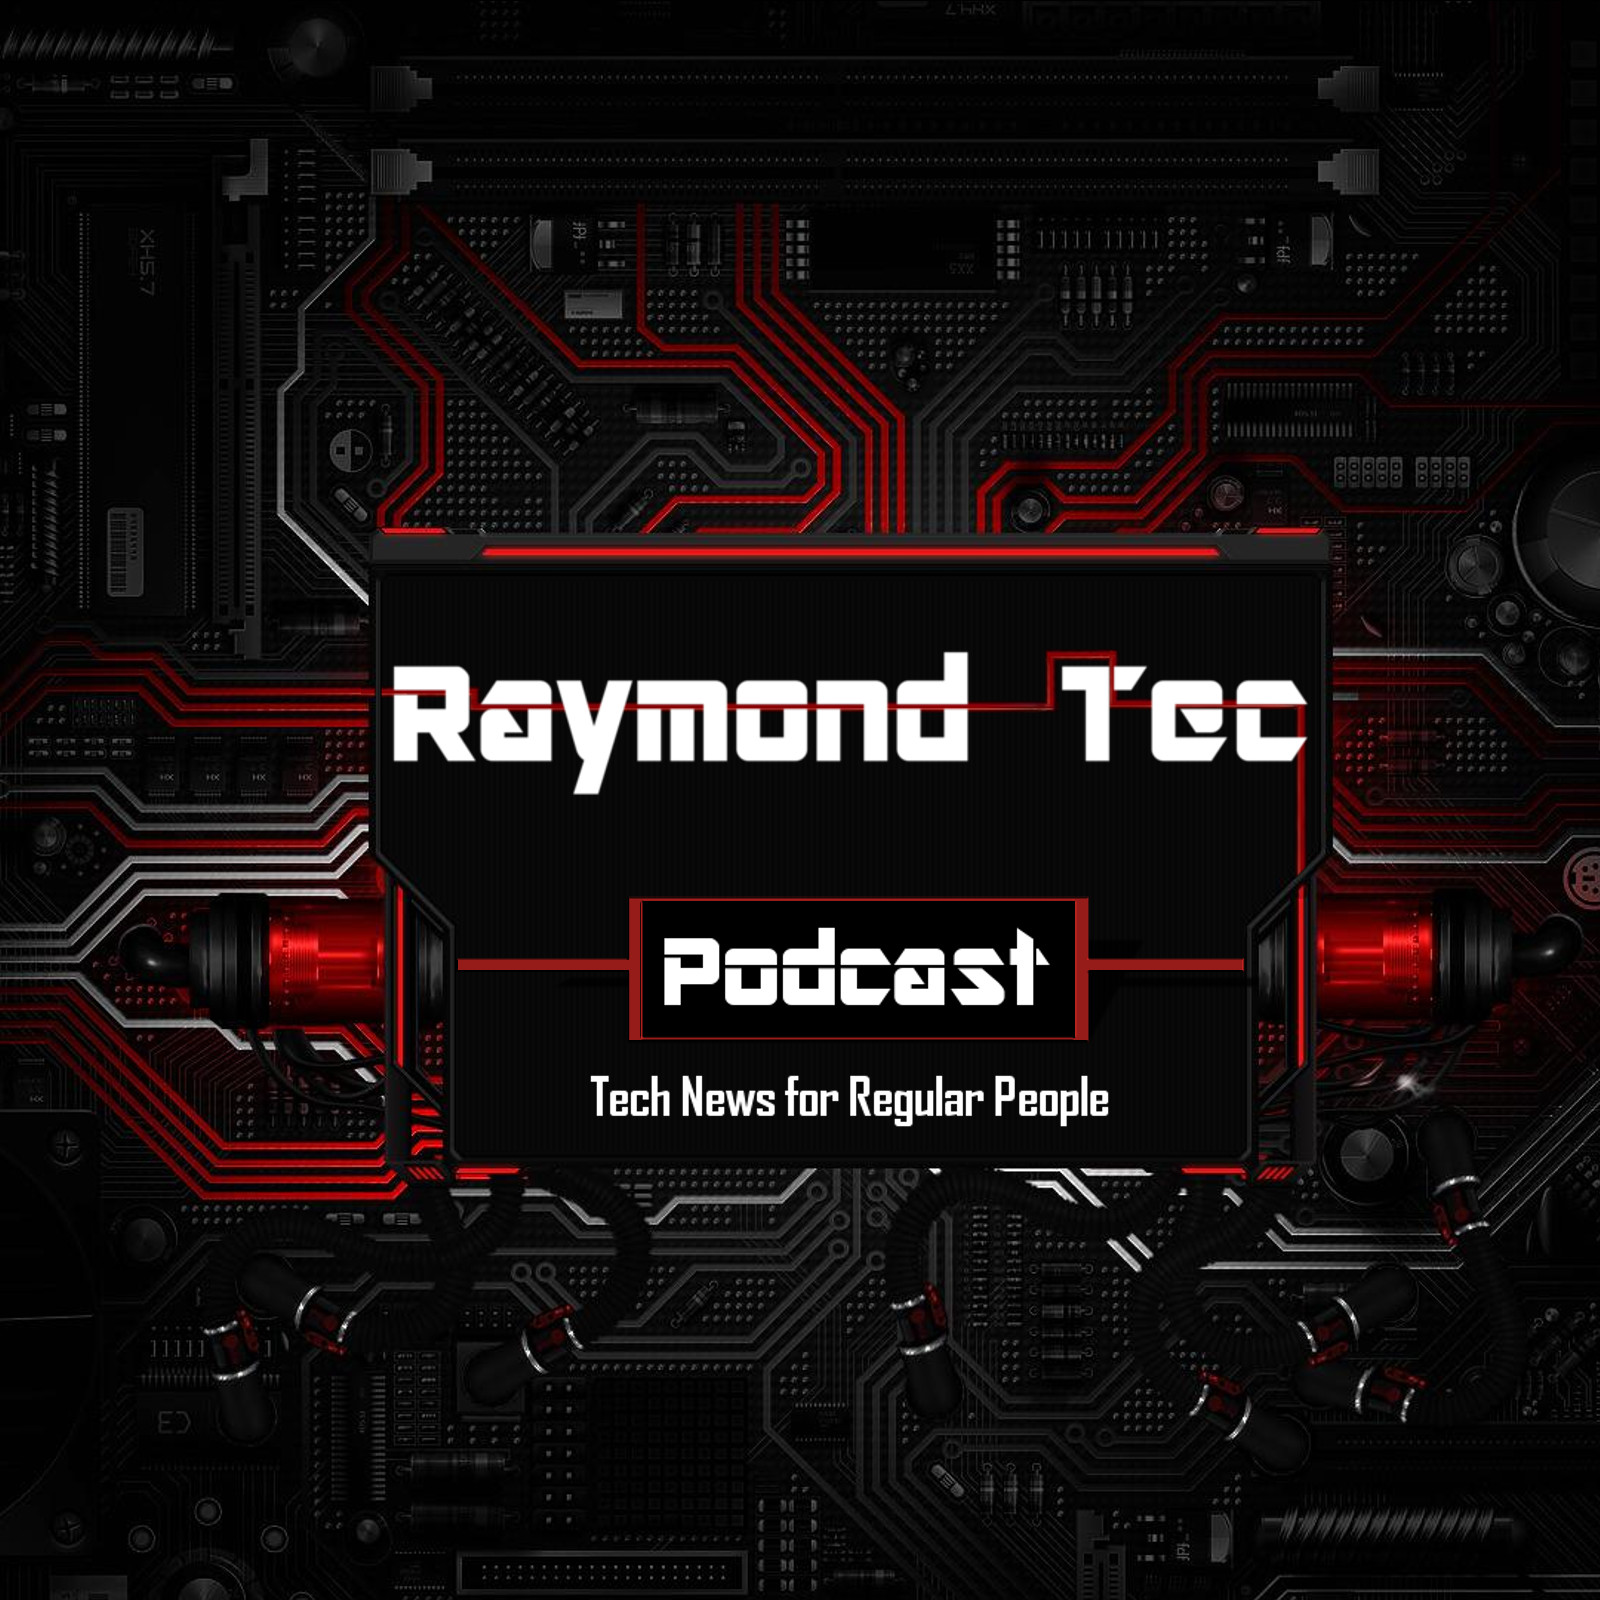 Raymond Tec Podcast Logo